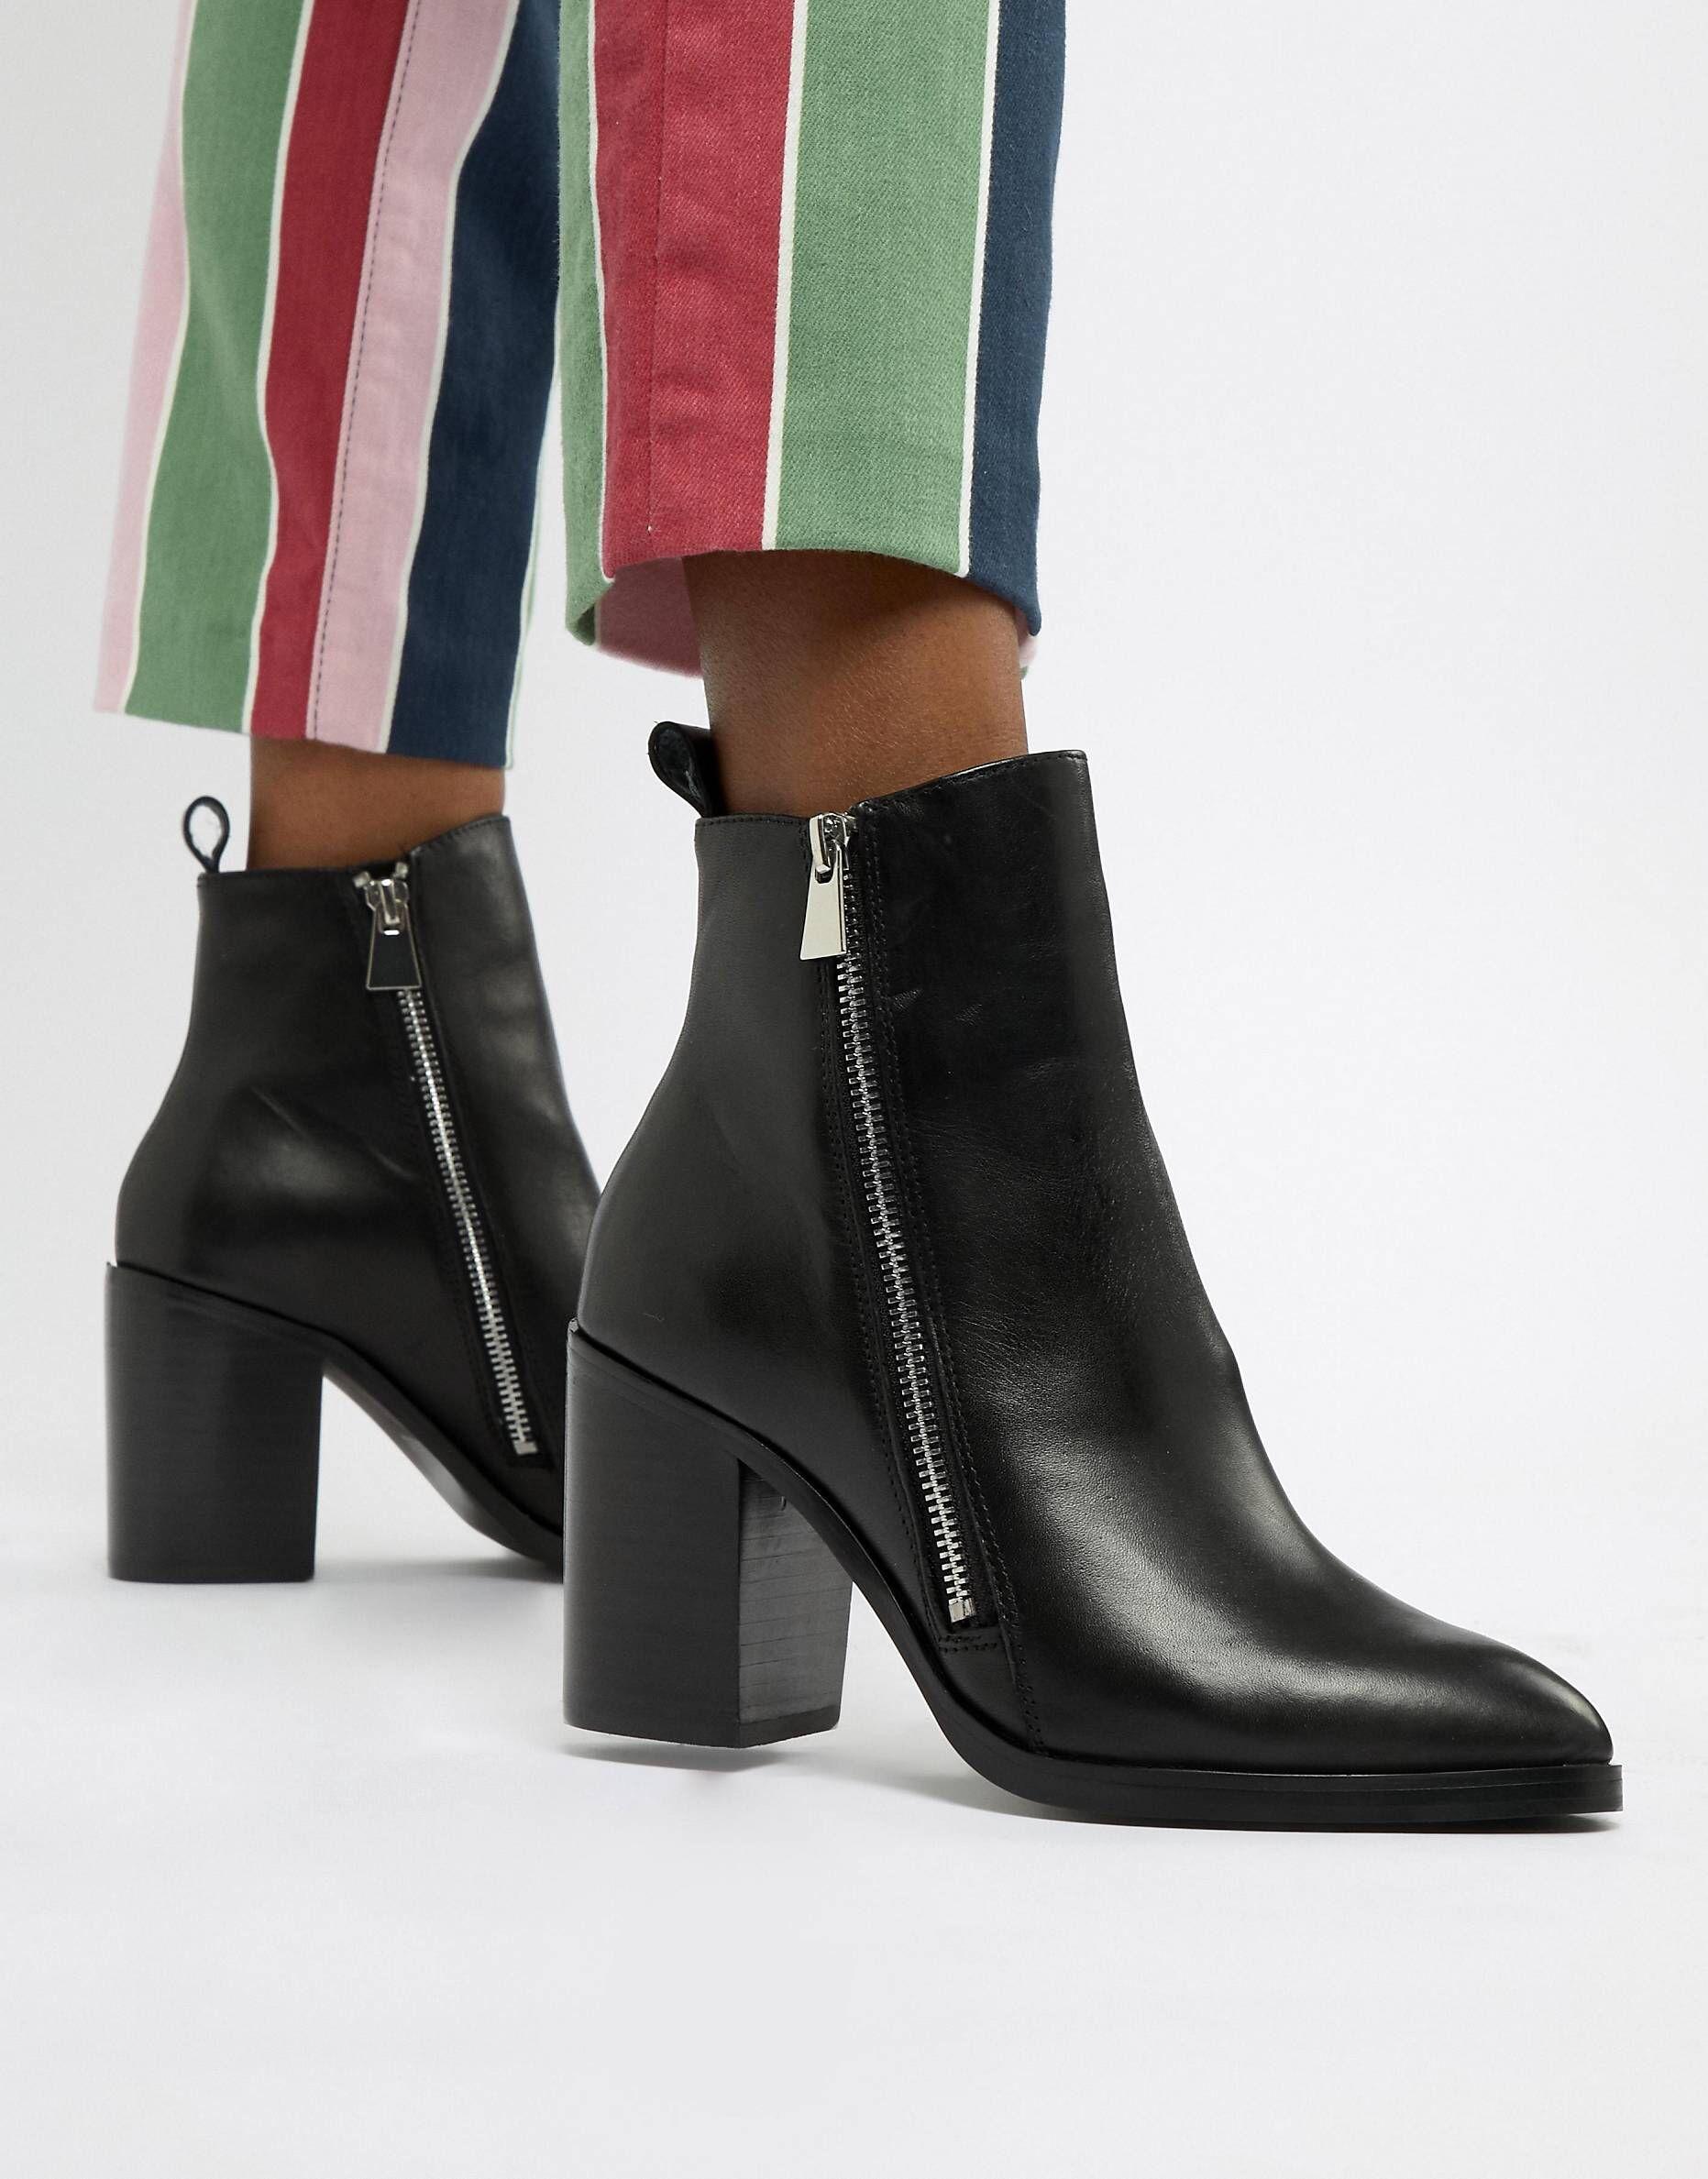 996c5f77242 Steve Madden Tasha Leather Side Zip Heeled Boot in 2019 | SHOES ...